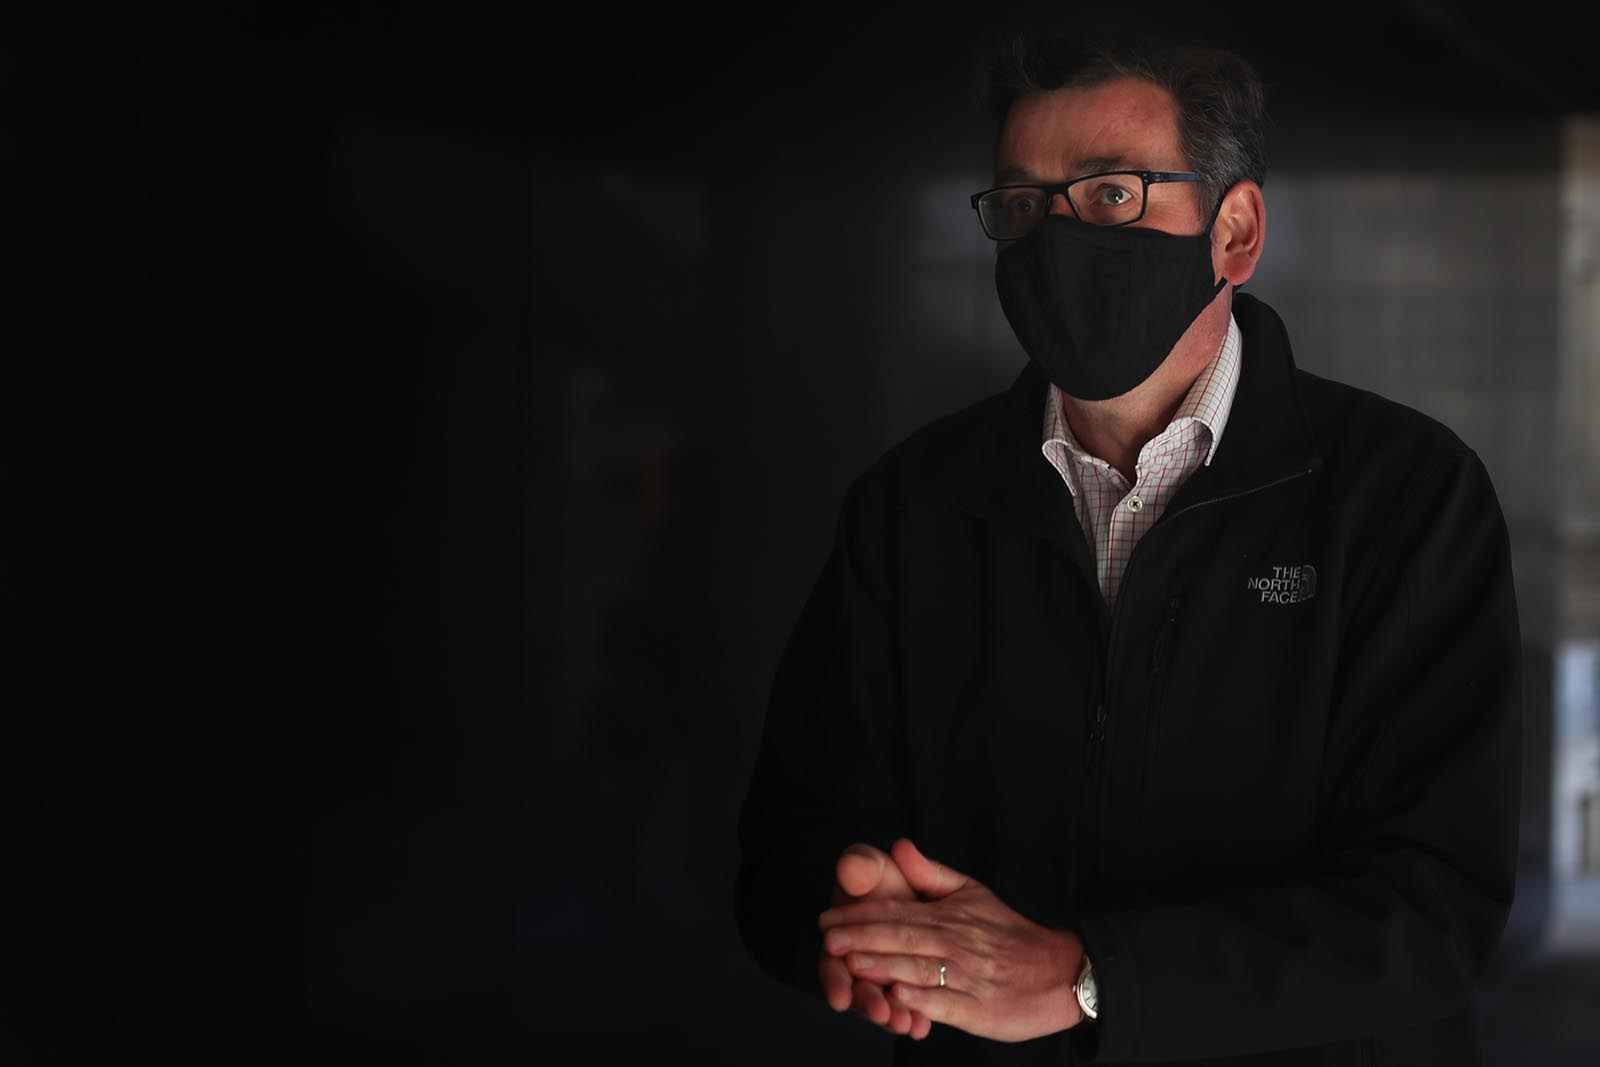 Victoria Premier Daniel Andrews leaves after speaking at a news conference on October 26, in Melbourne, Australia.